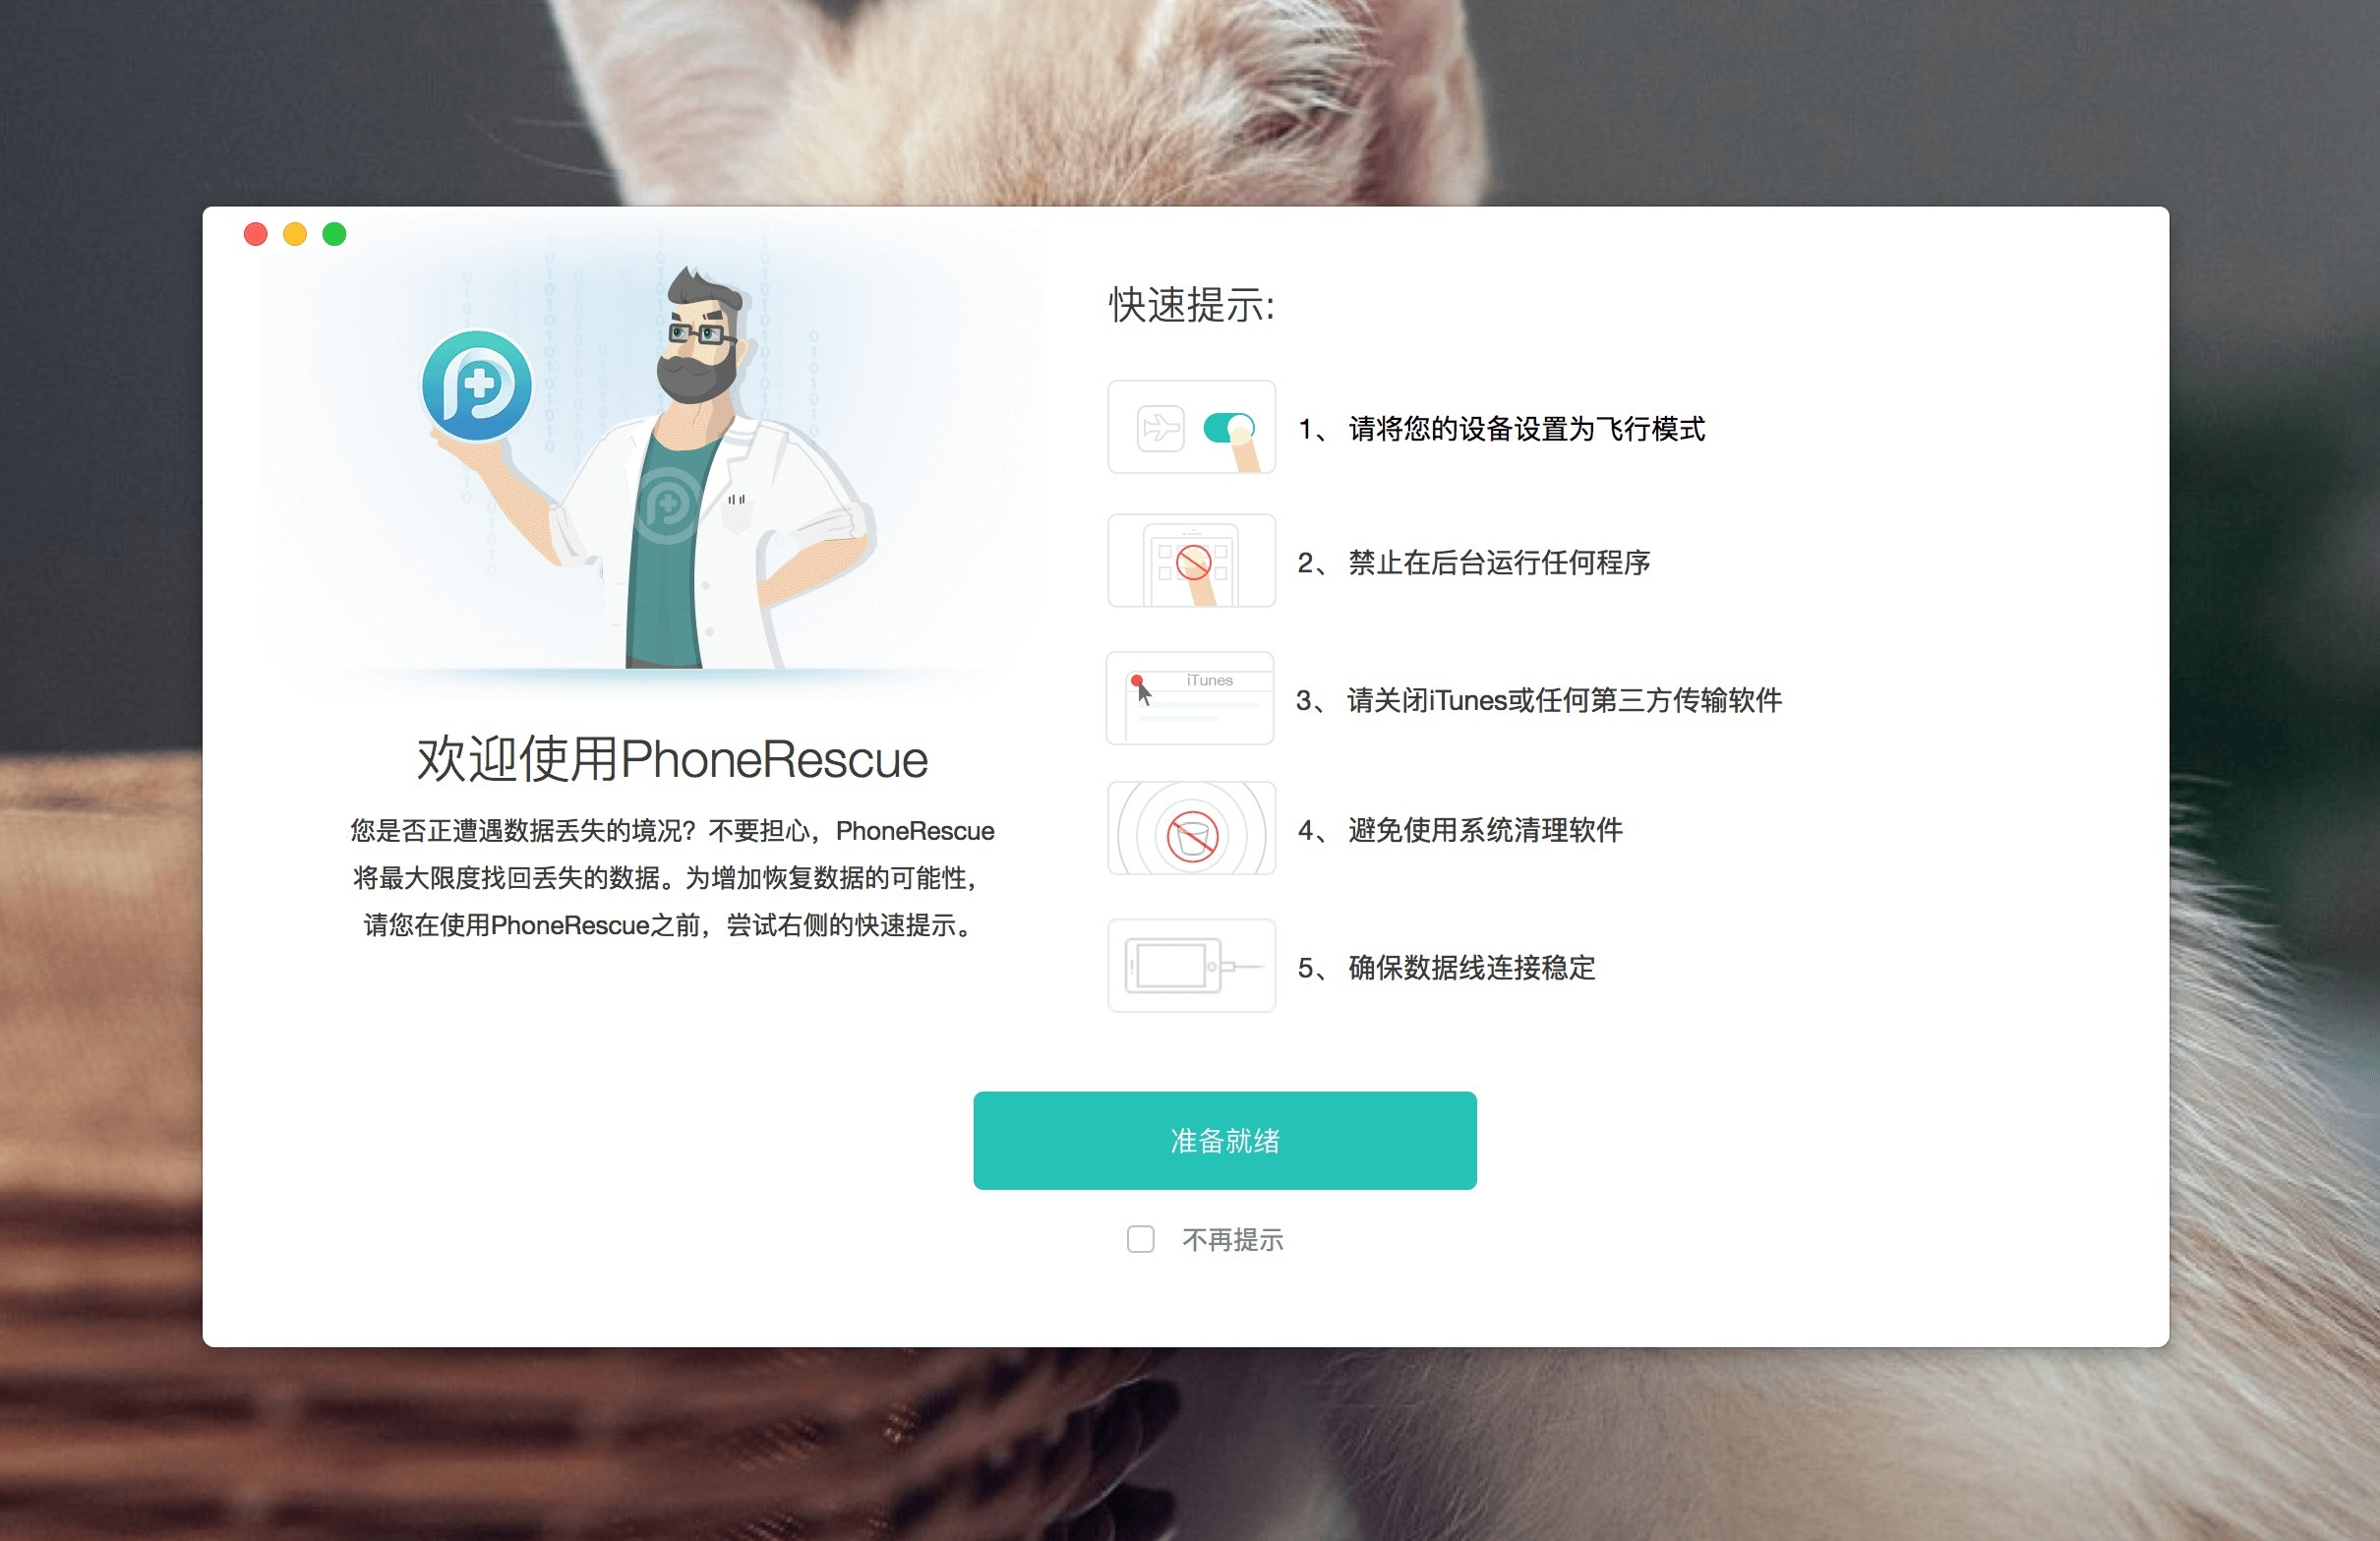 PhoneRescue for iOS 4.0.0 (20200722) iPhone数据恢复软件-马克喵